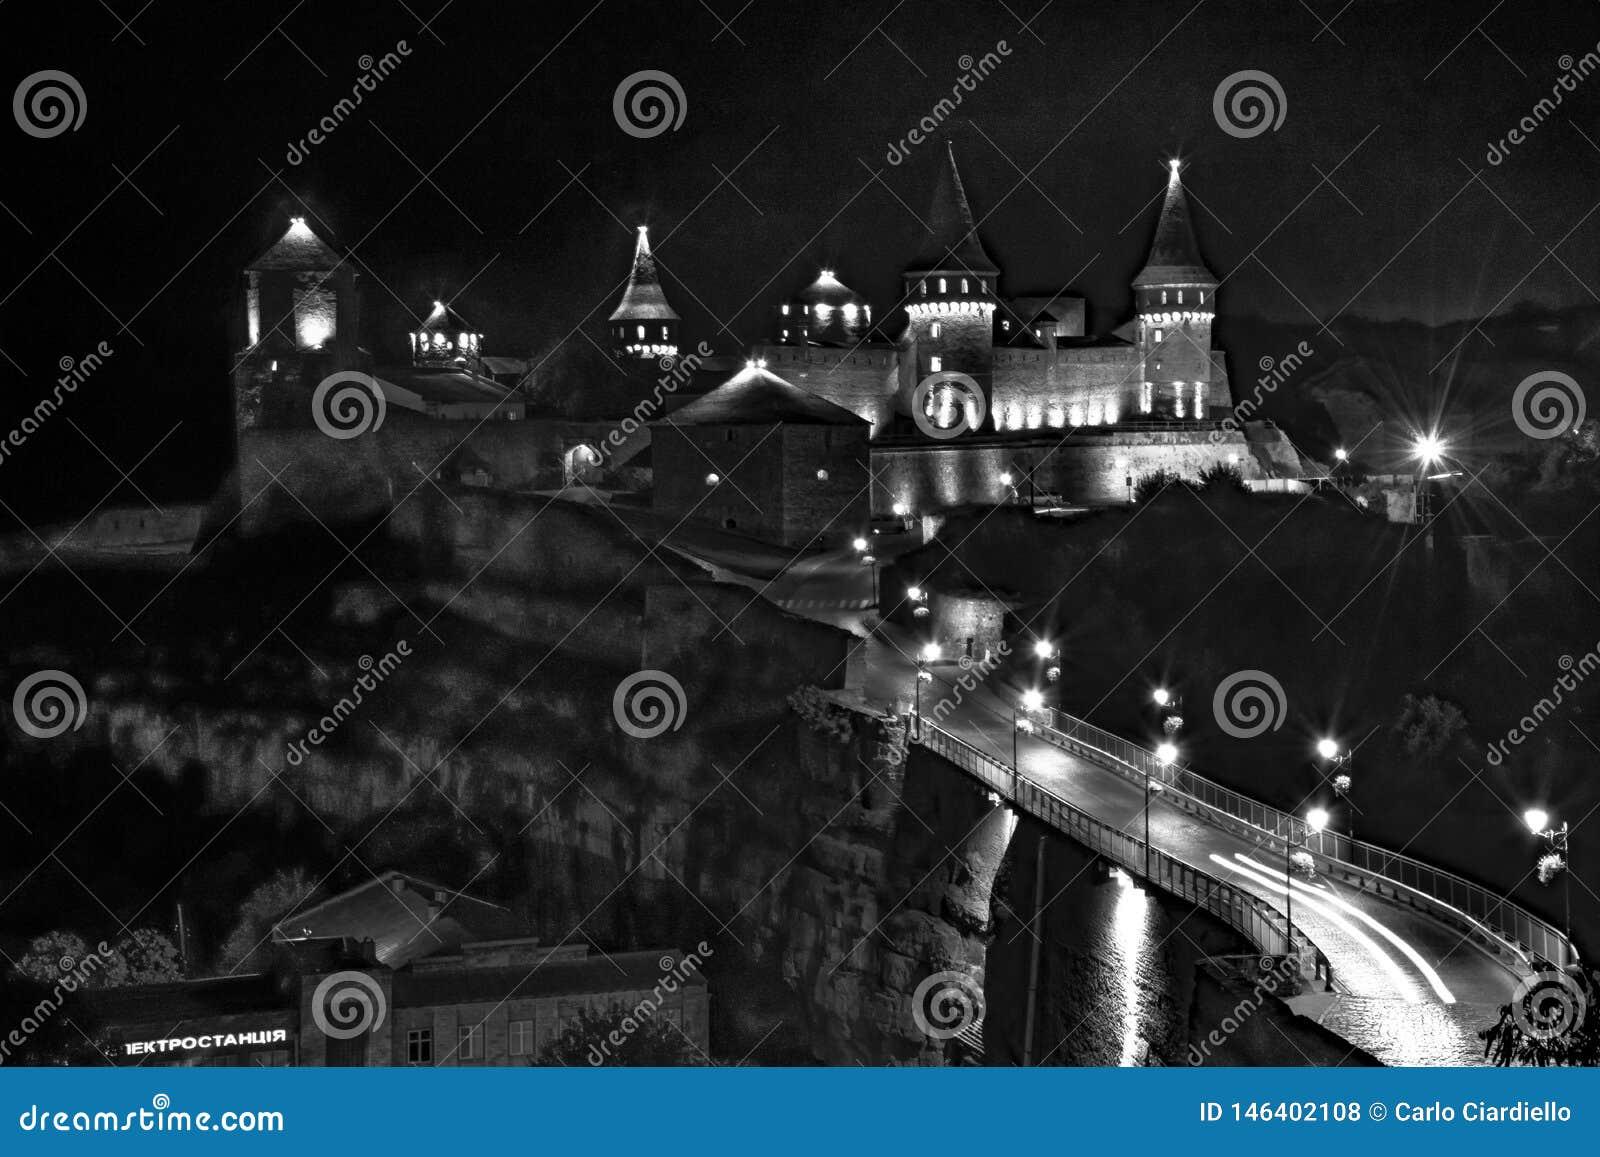 Kamianets-Podilskyi castele  night black and white